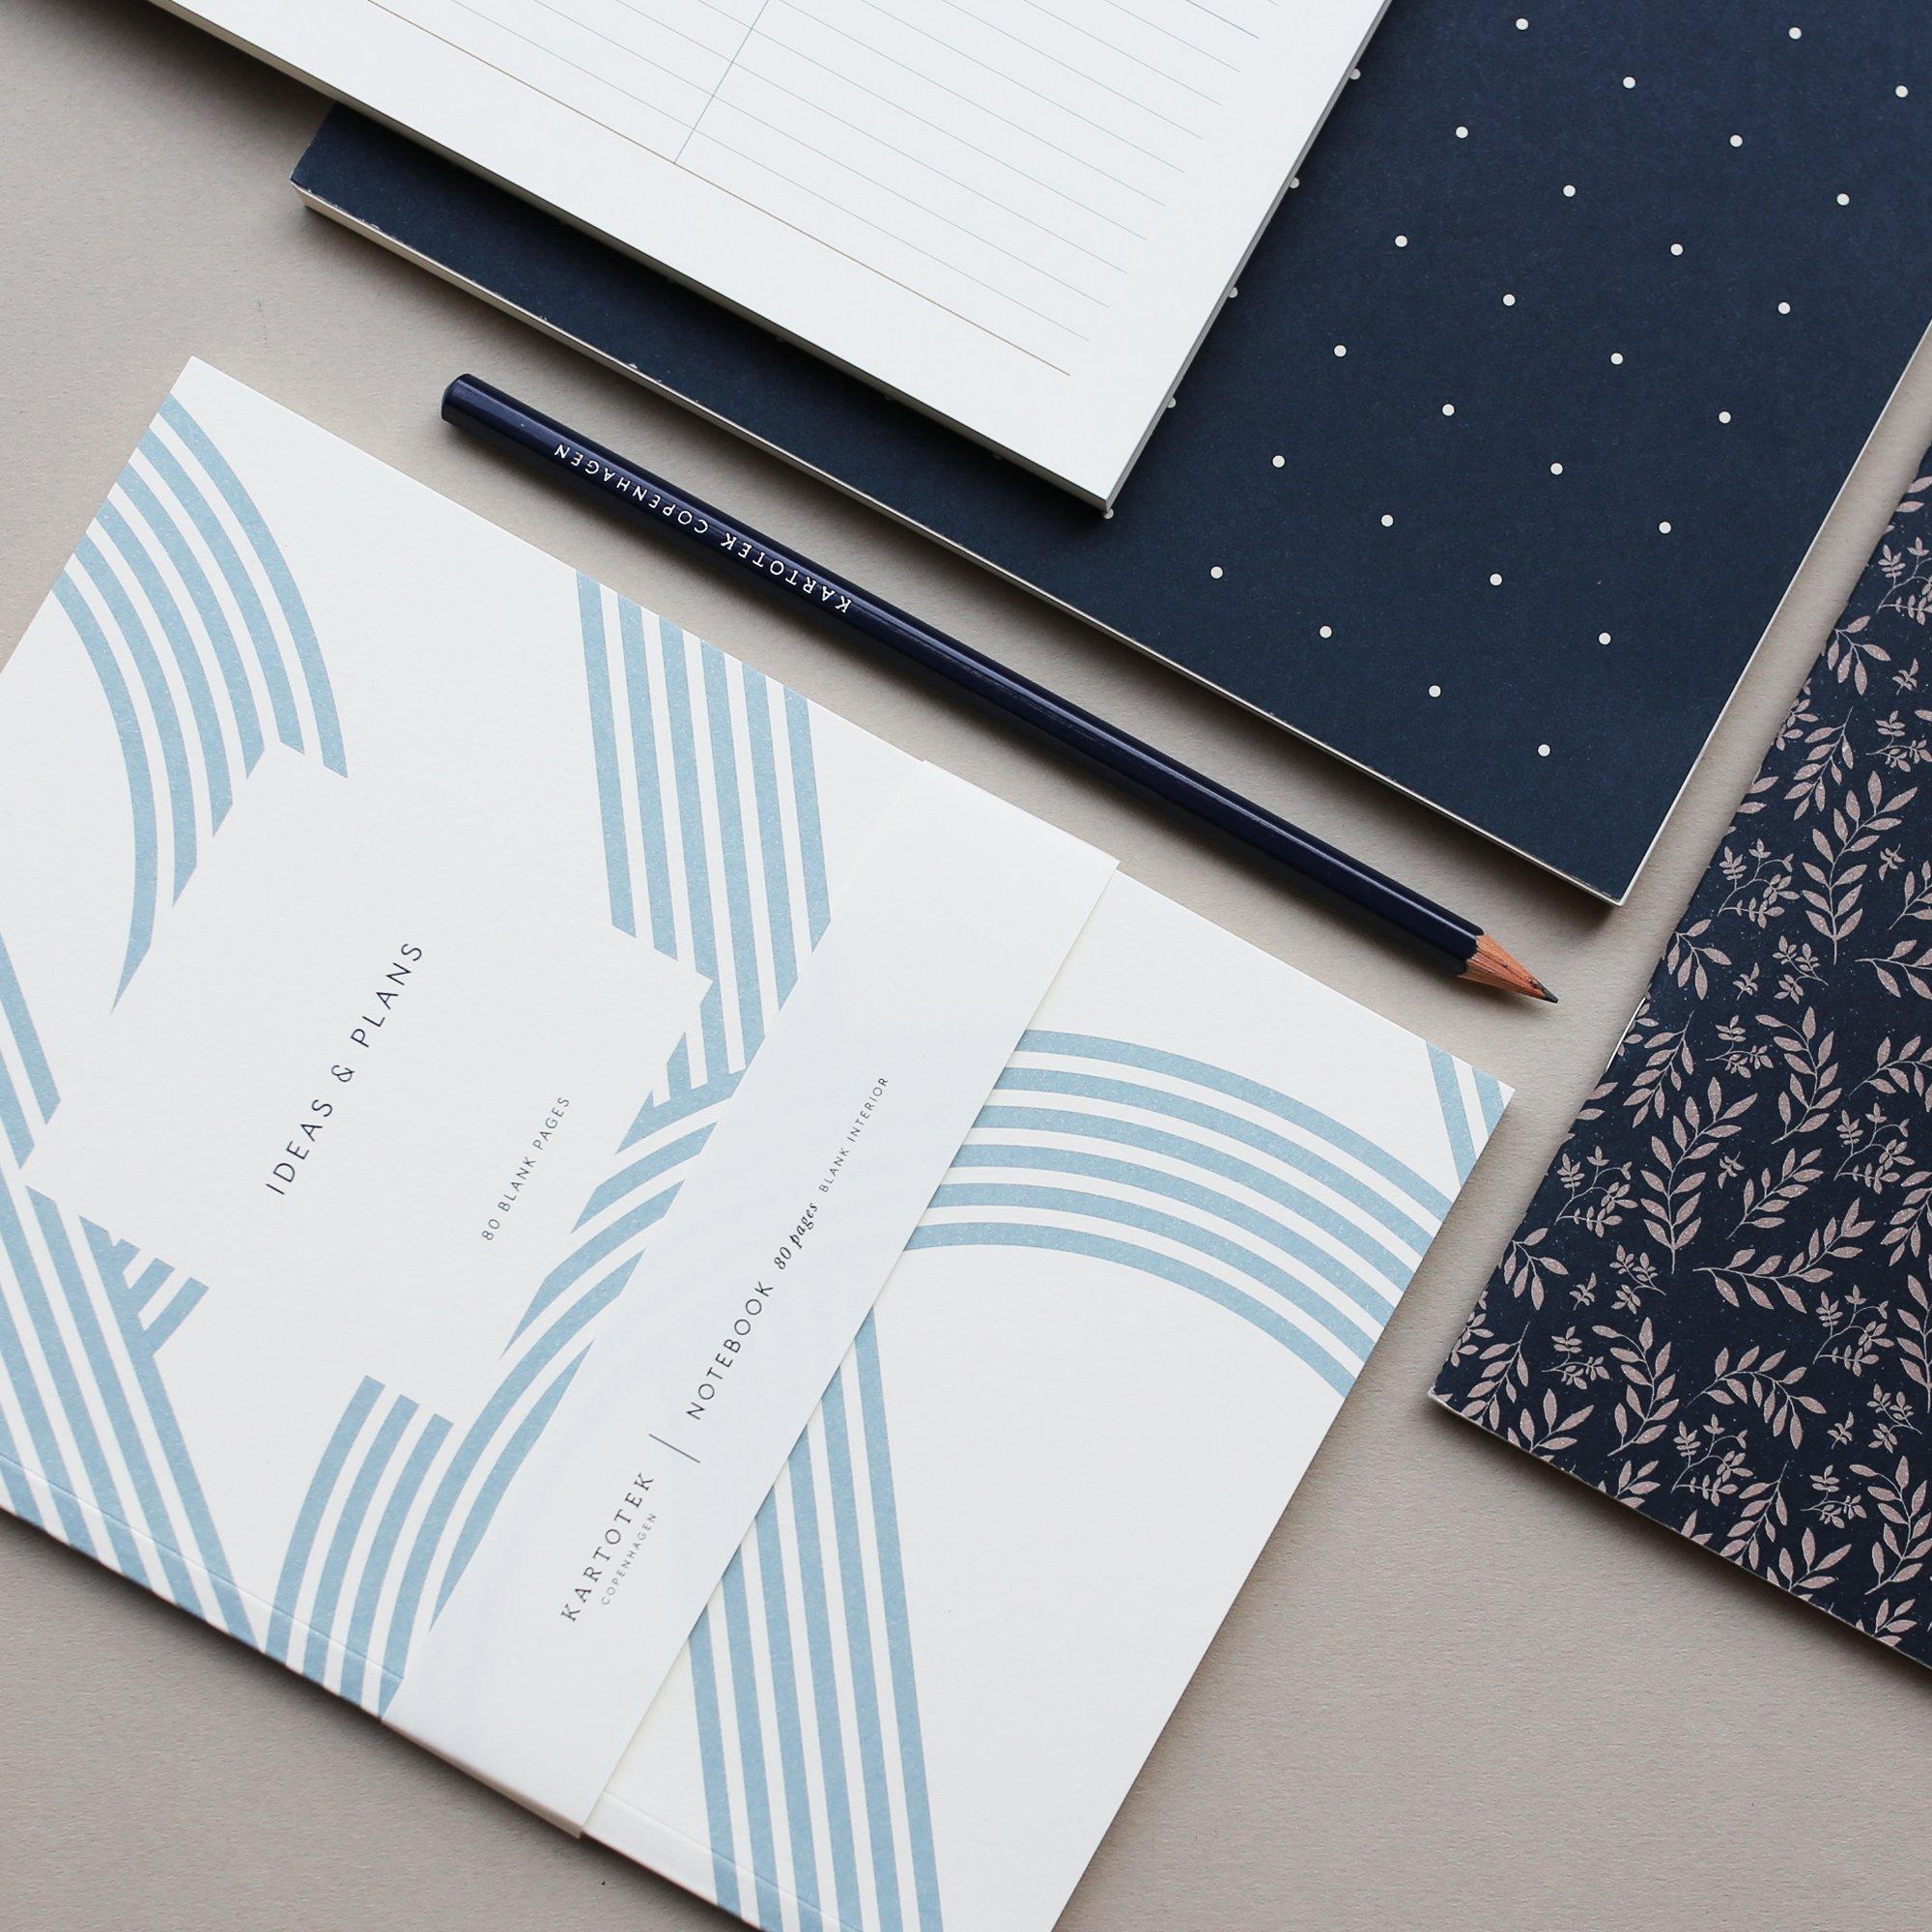 Cuaderno Kartotek Lines   A5   Hojas lisas   Azul